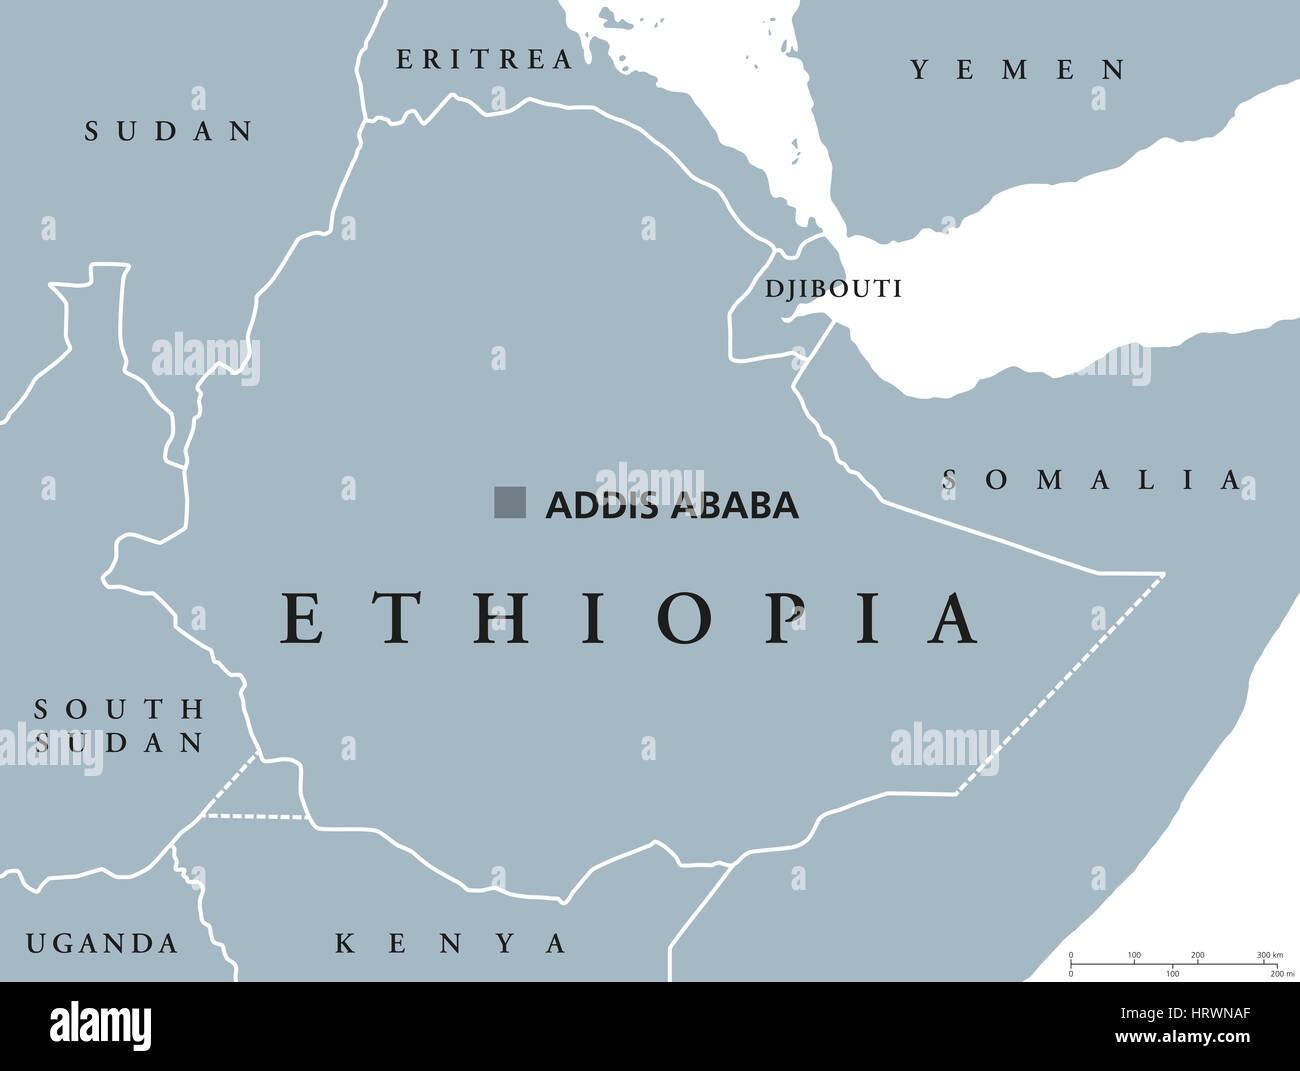 Addis Ababa Ethiopia Map Ethiopia political map with capital Addis Ababa and borders